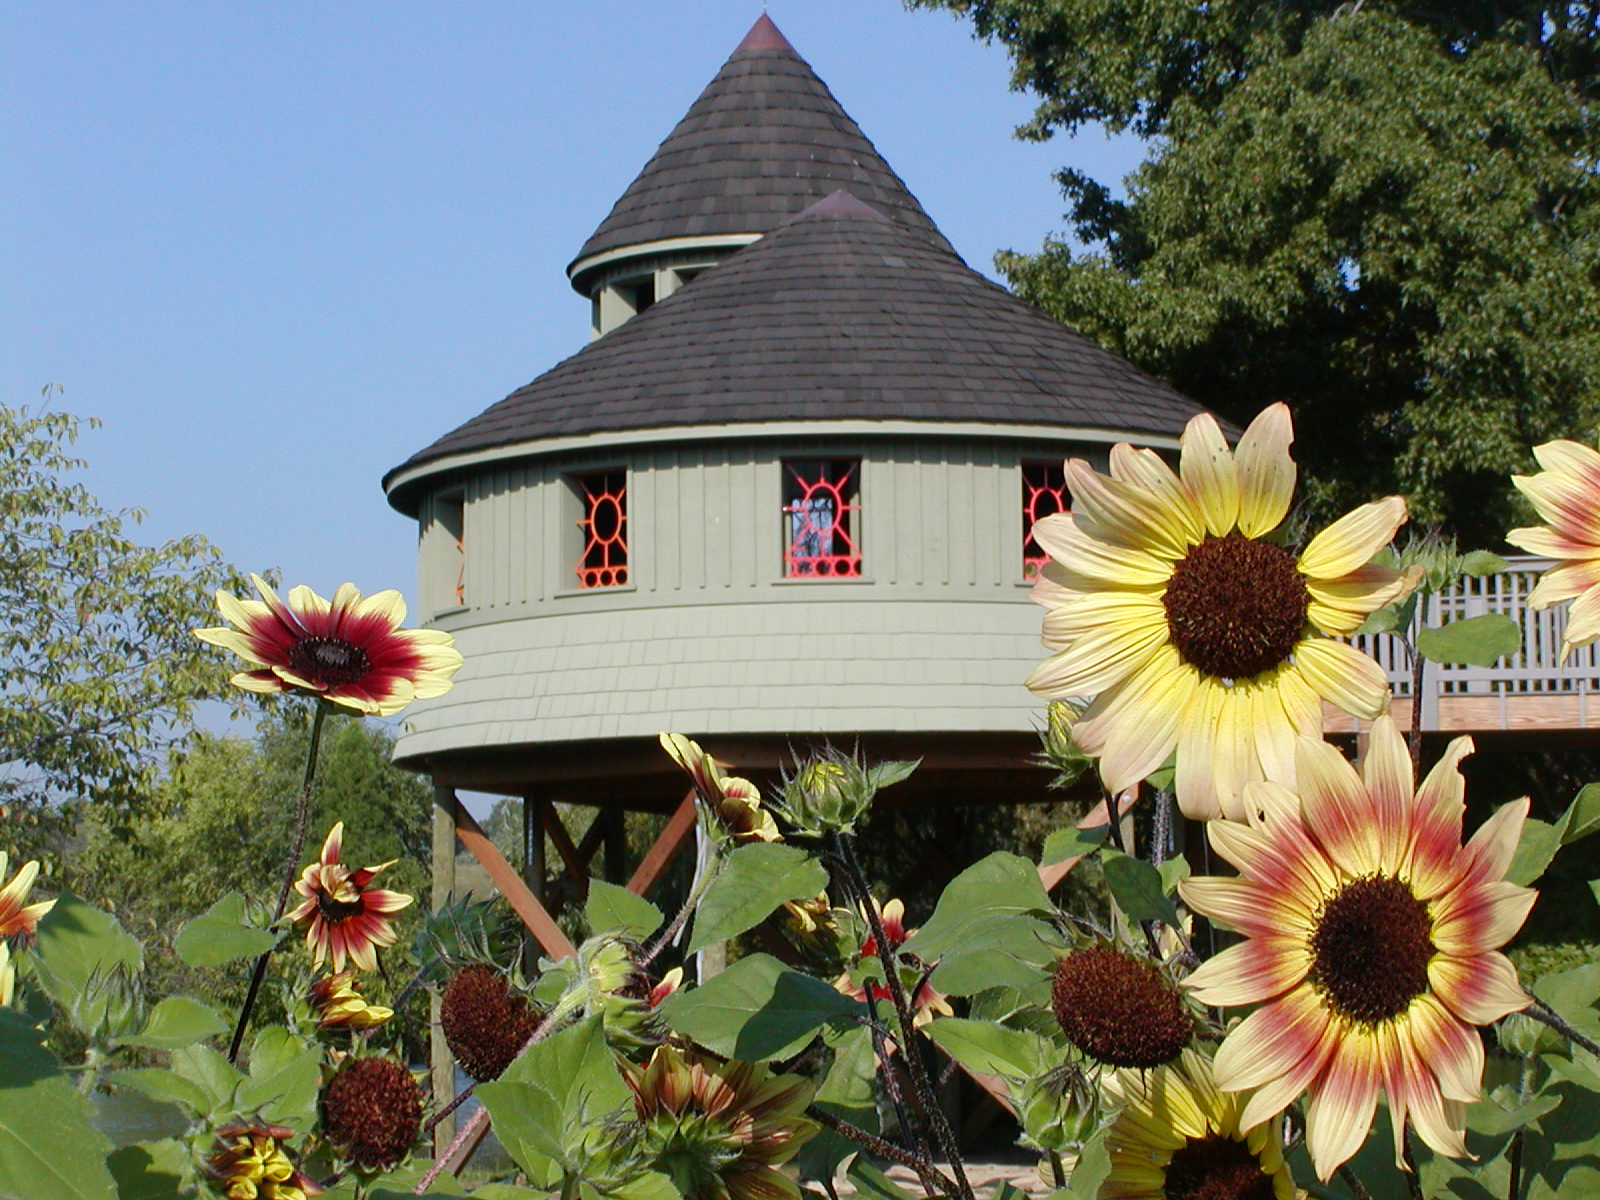 Summer Sunflowers Tree House.jpg